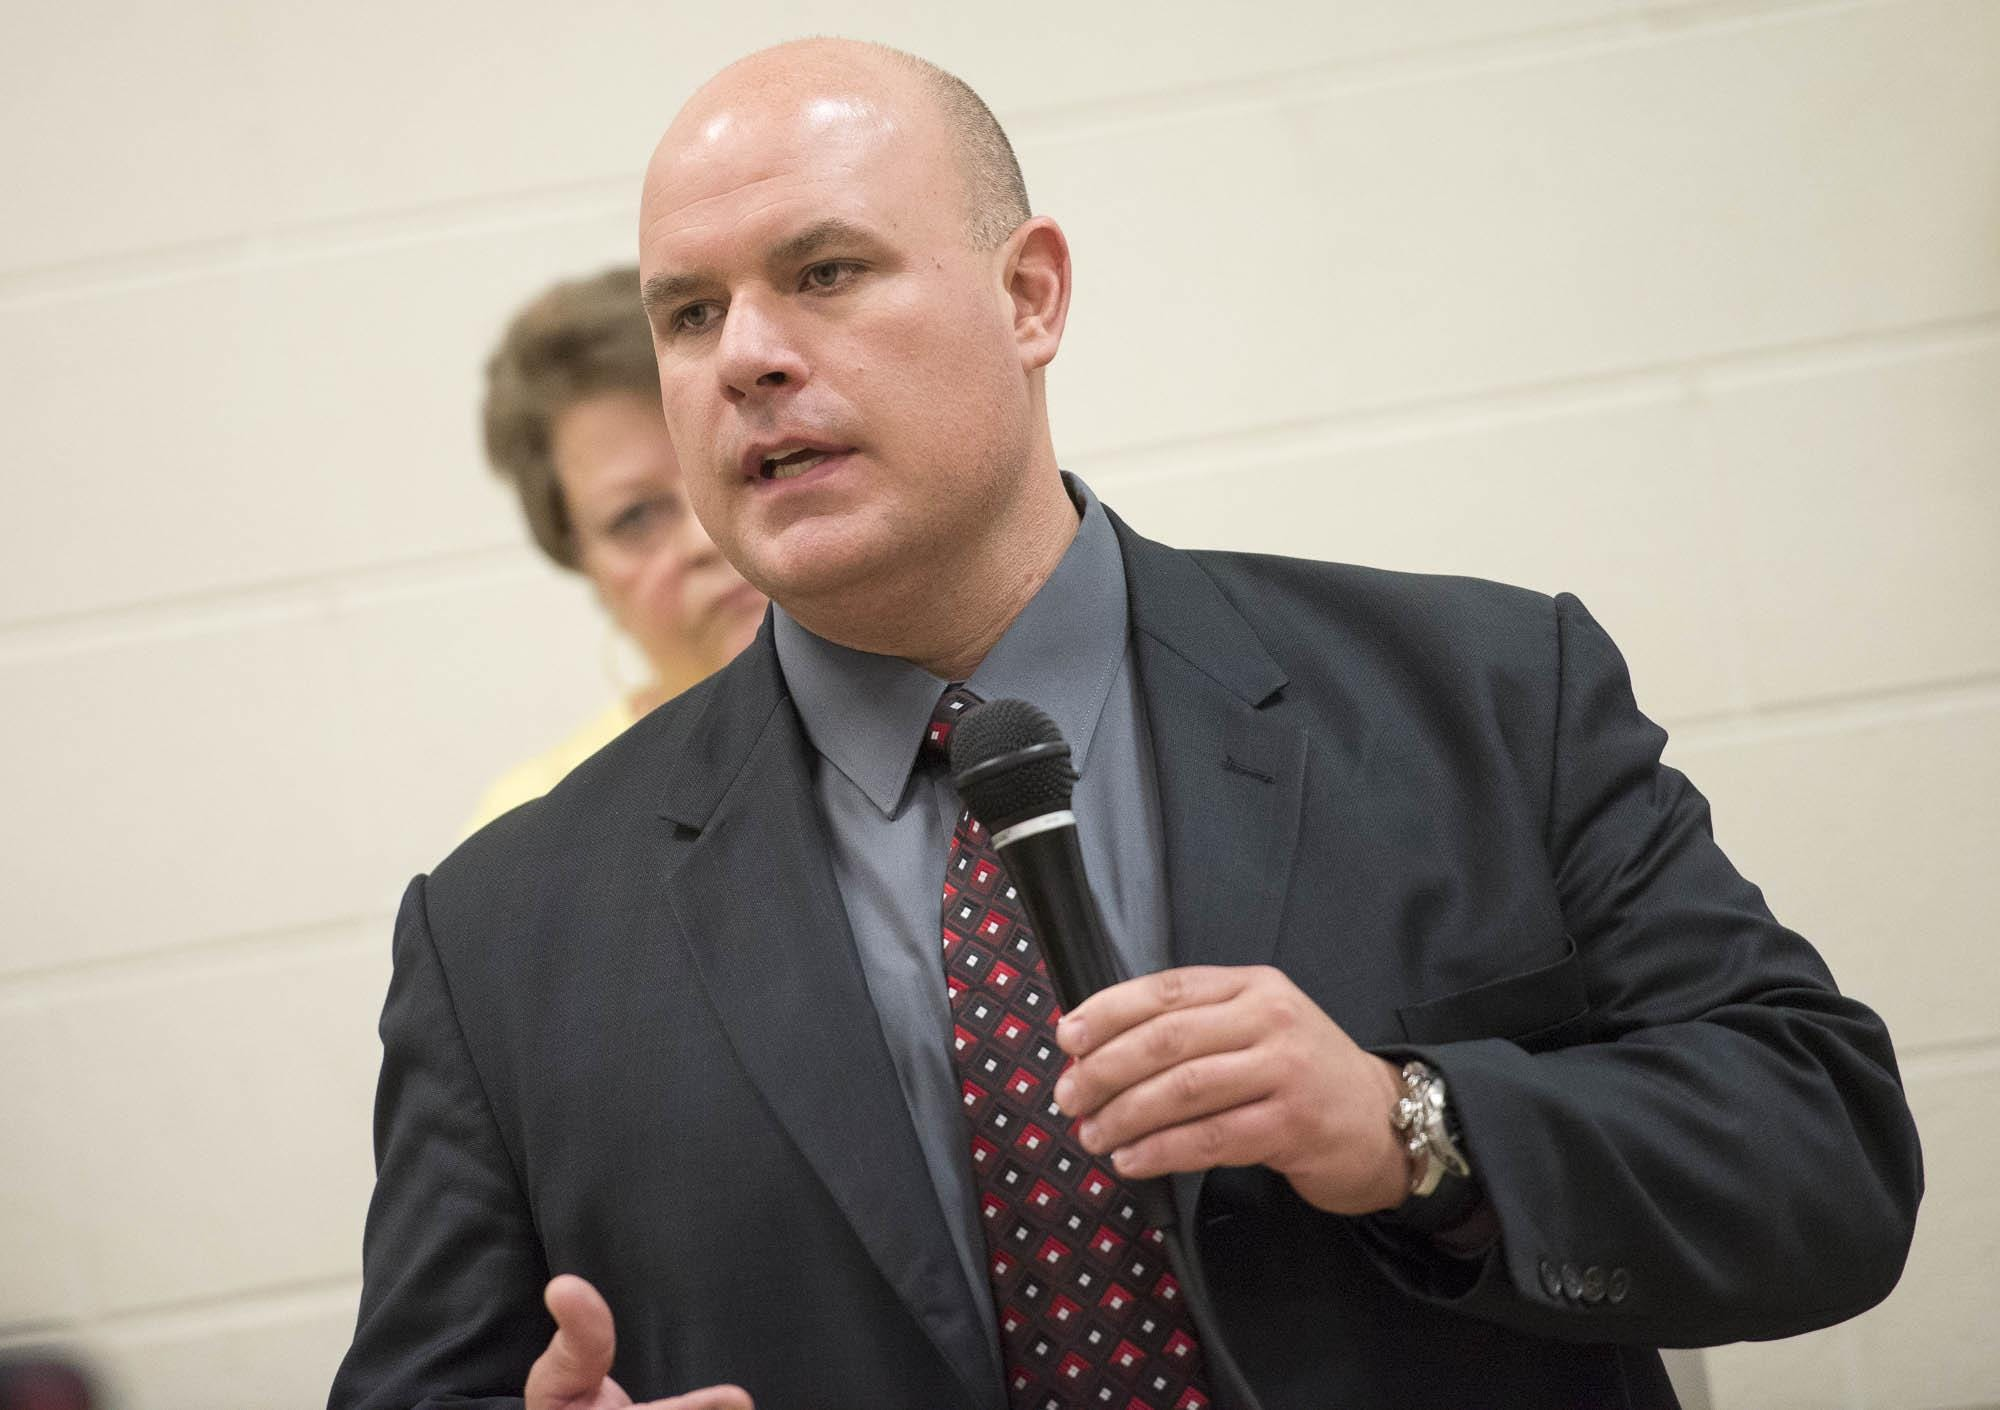 Van Buren Township mandates COVID-19 vaccines, unions push back